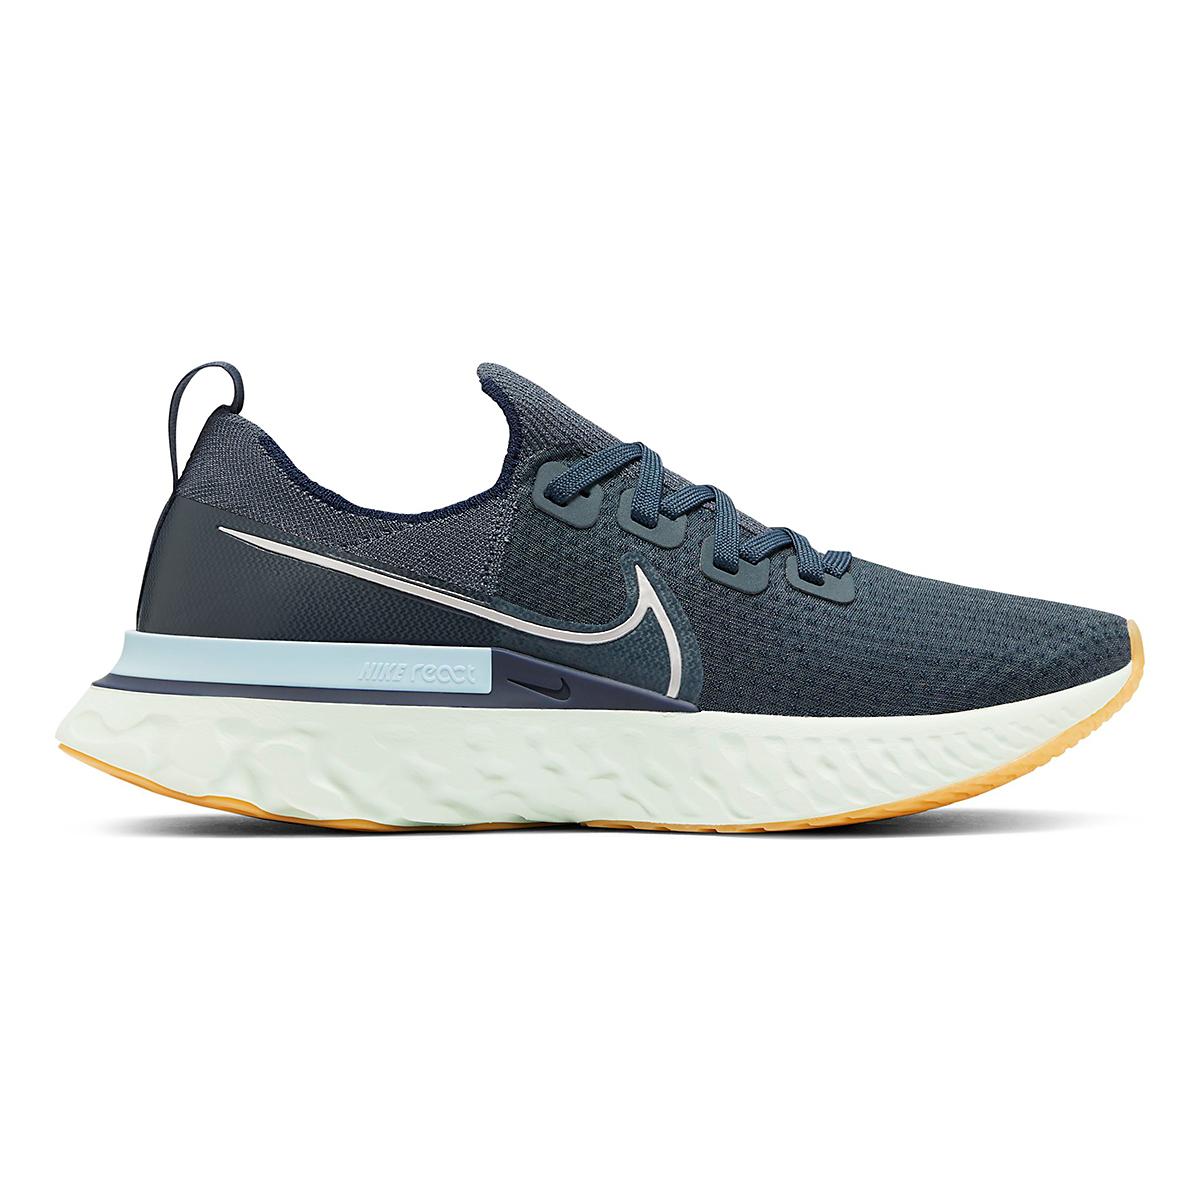 Men's Nike React Infinity Run Flyknit Running Shoe - Color: Blue Fox/Metallic Silver - Size: 6 - Width: Regular, Blue Fox/Metallic Silver, large, image 1